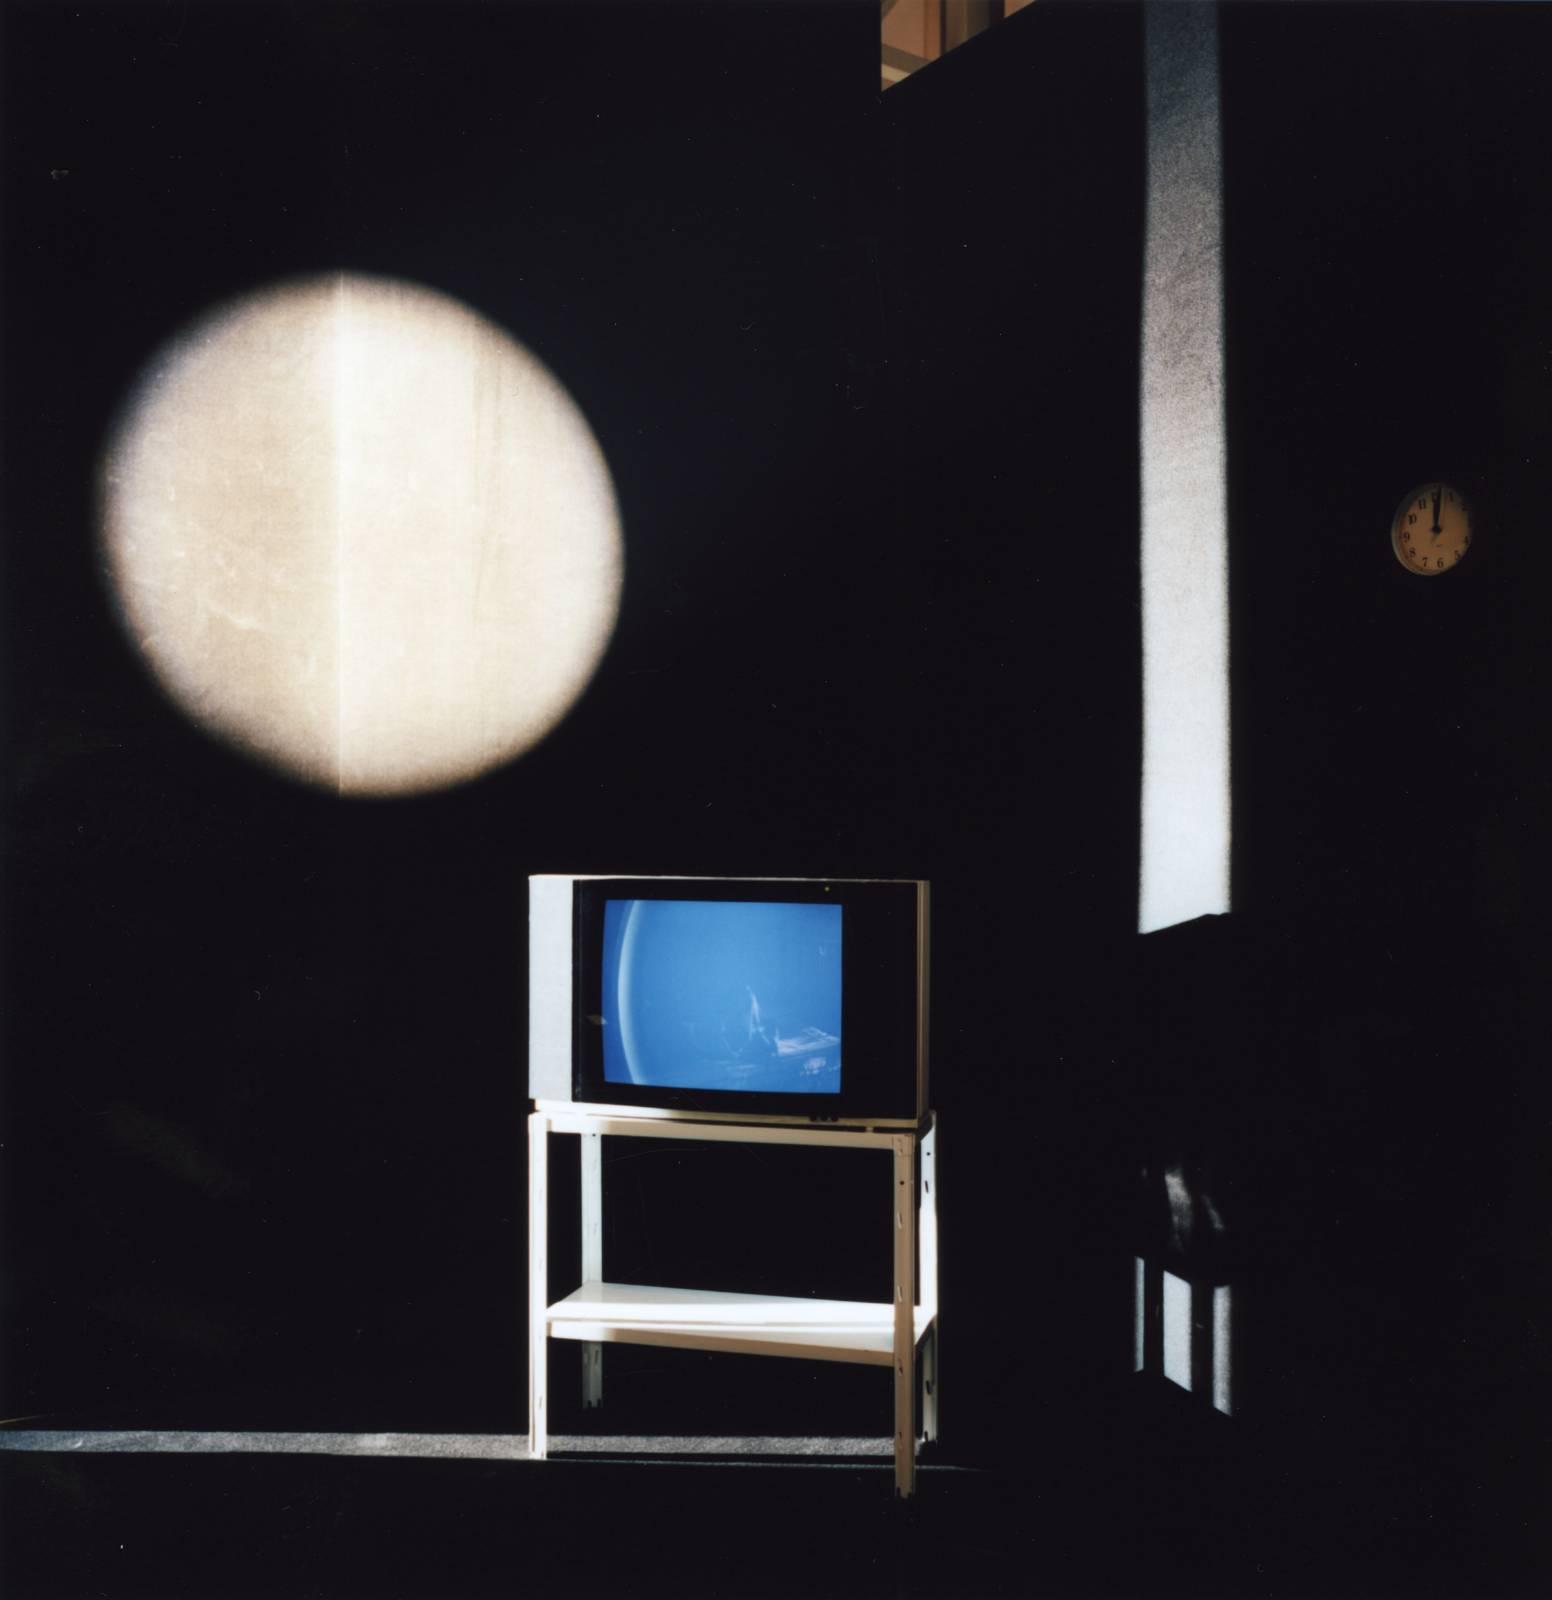 Room 2202, 2011, C-print, 80 x 80 cm